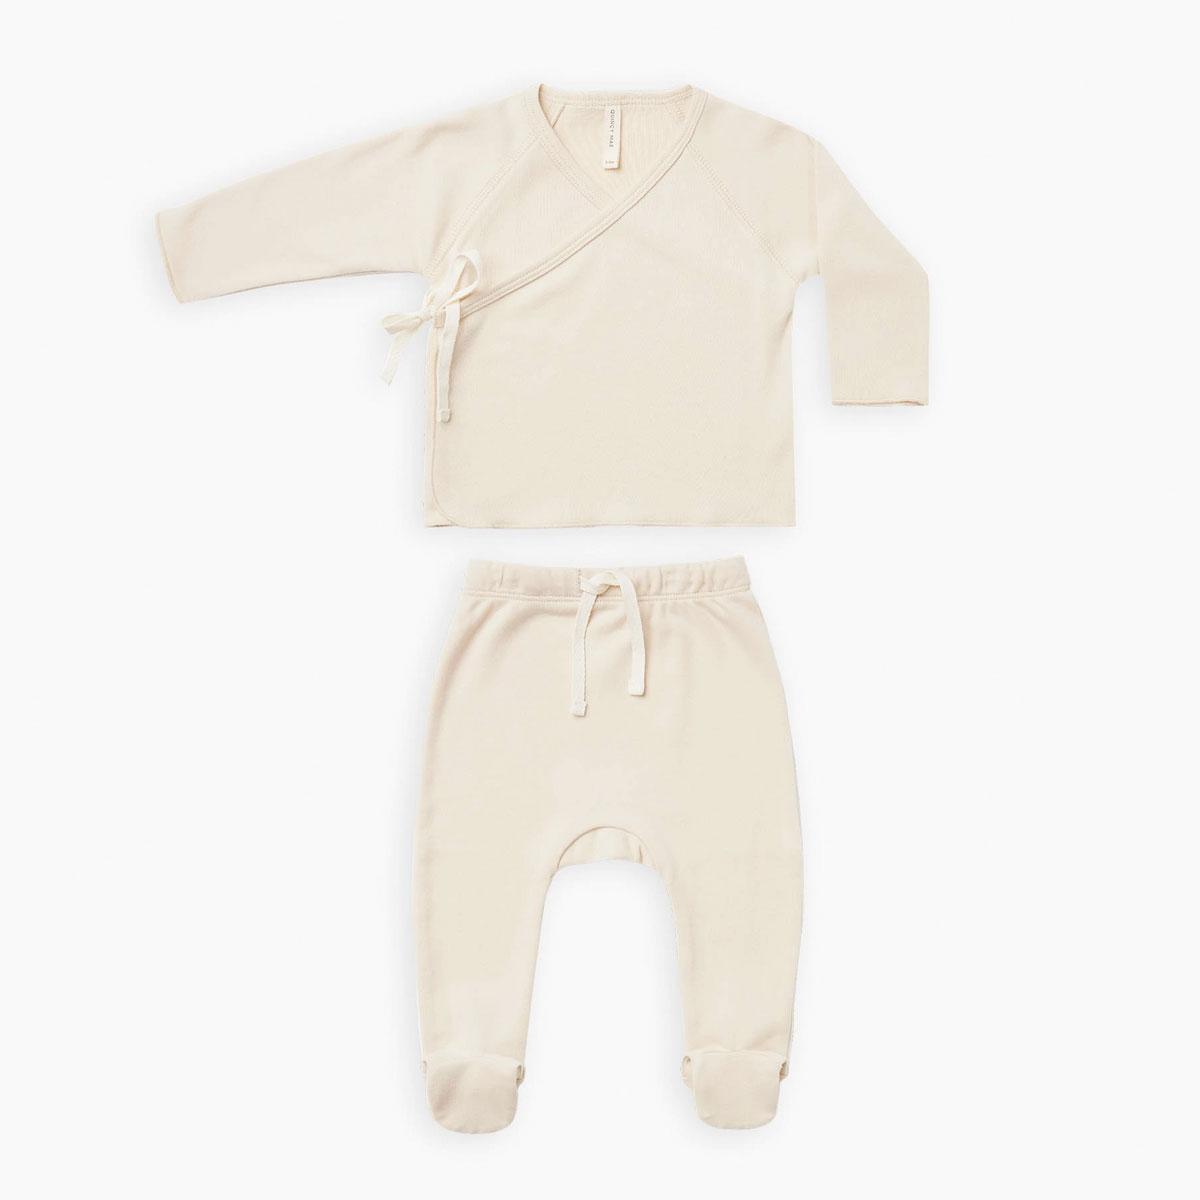 Quincy Mae オーガニックコットン  Kimono Top + Footed Pant SET 6-12M [ネコポス対応可] NATURAL 60 出産祝